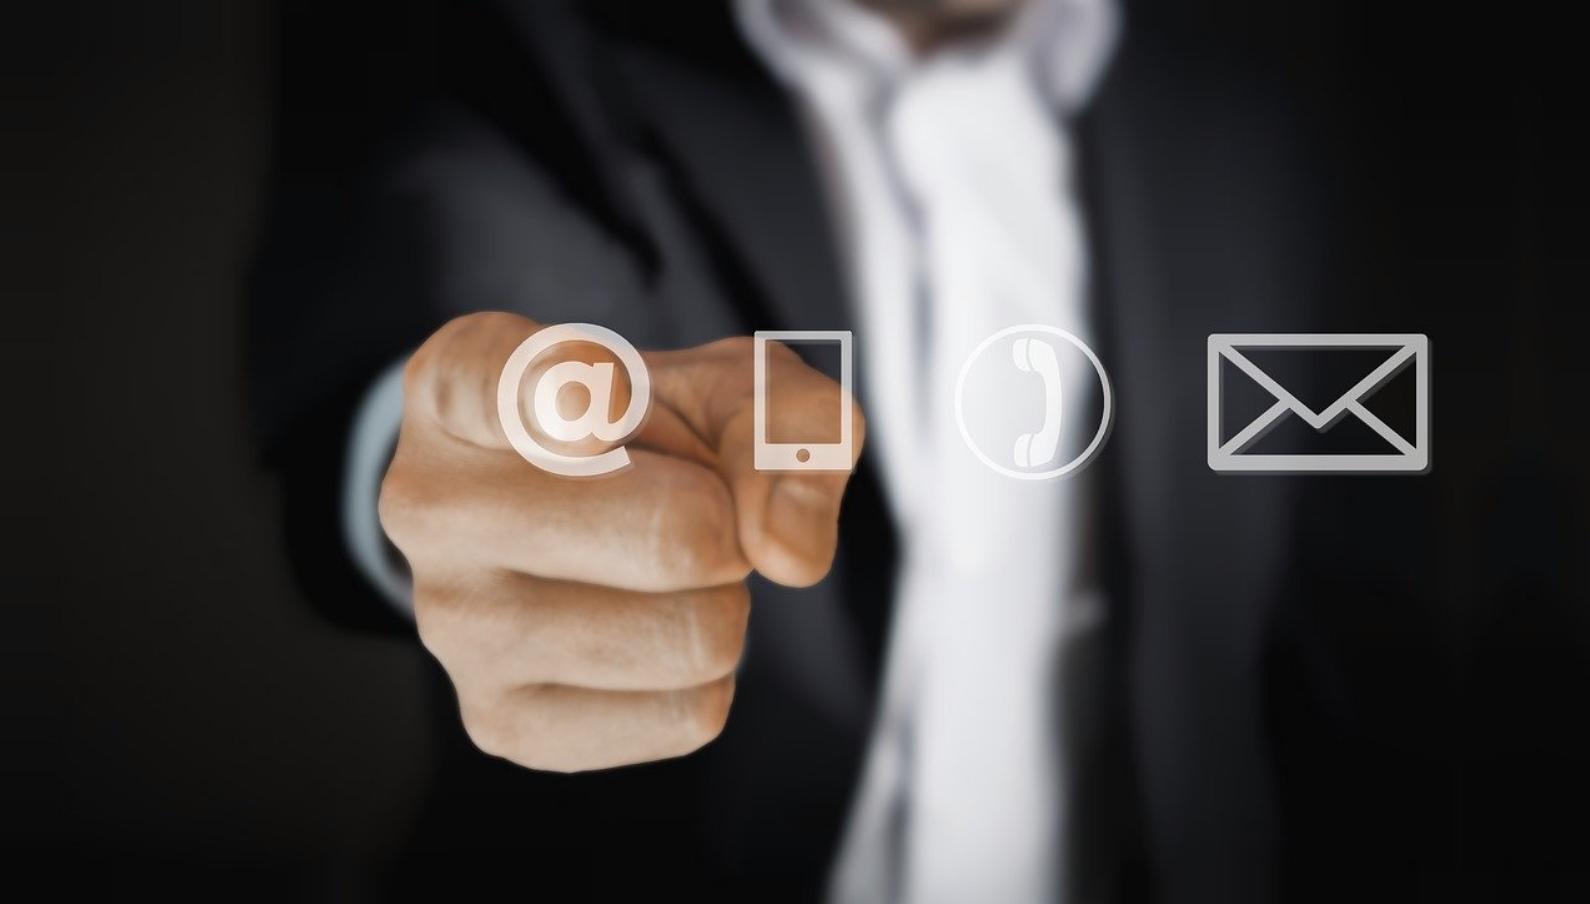 Customer support via email or messenger. CC: Pixabay